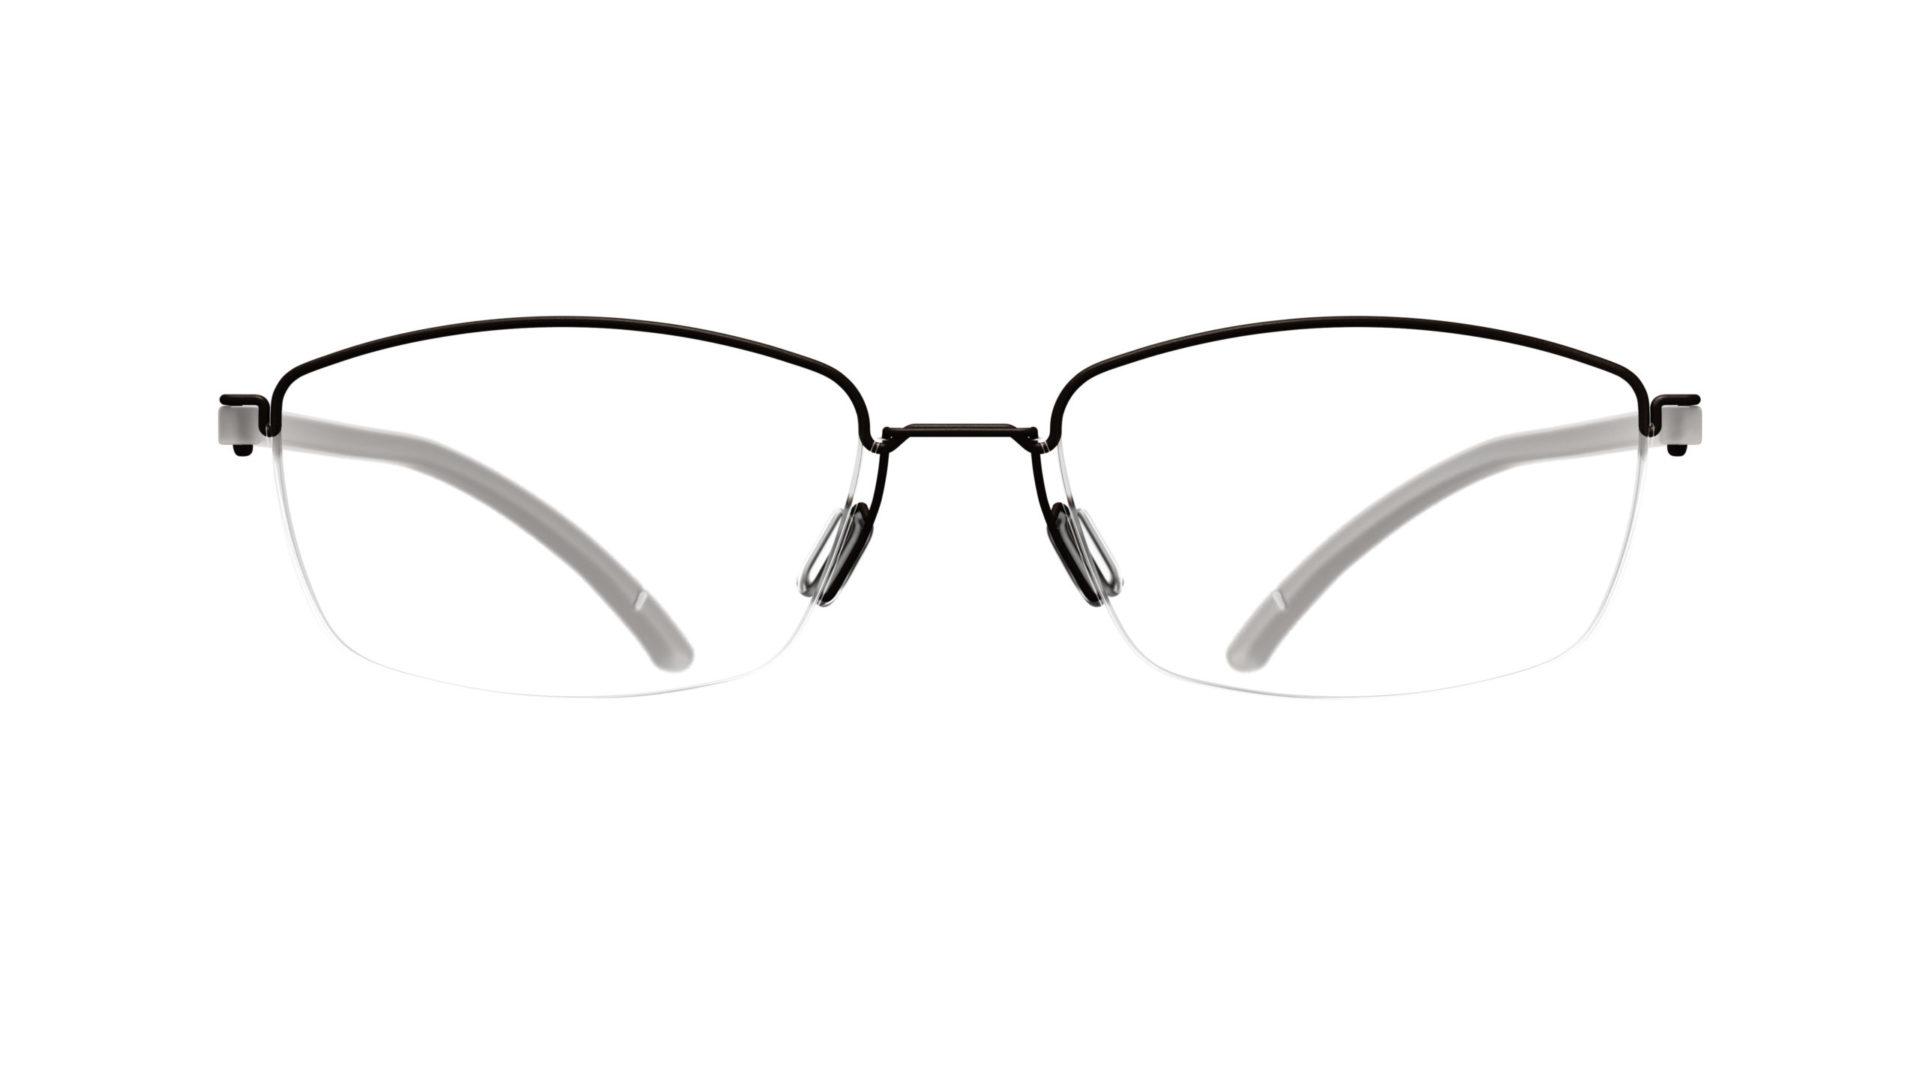 markus t design neo brillen muenchen scaled - Markus T Design Neo